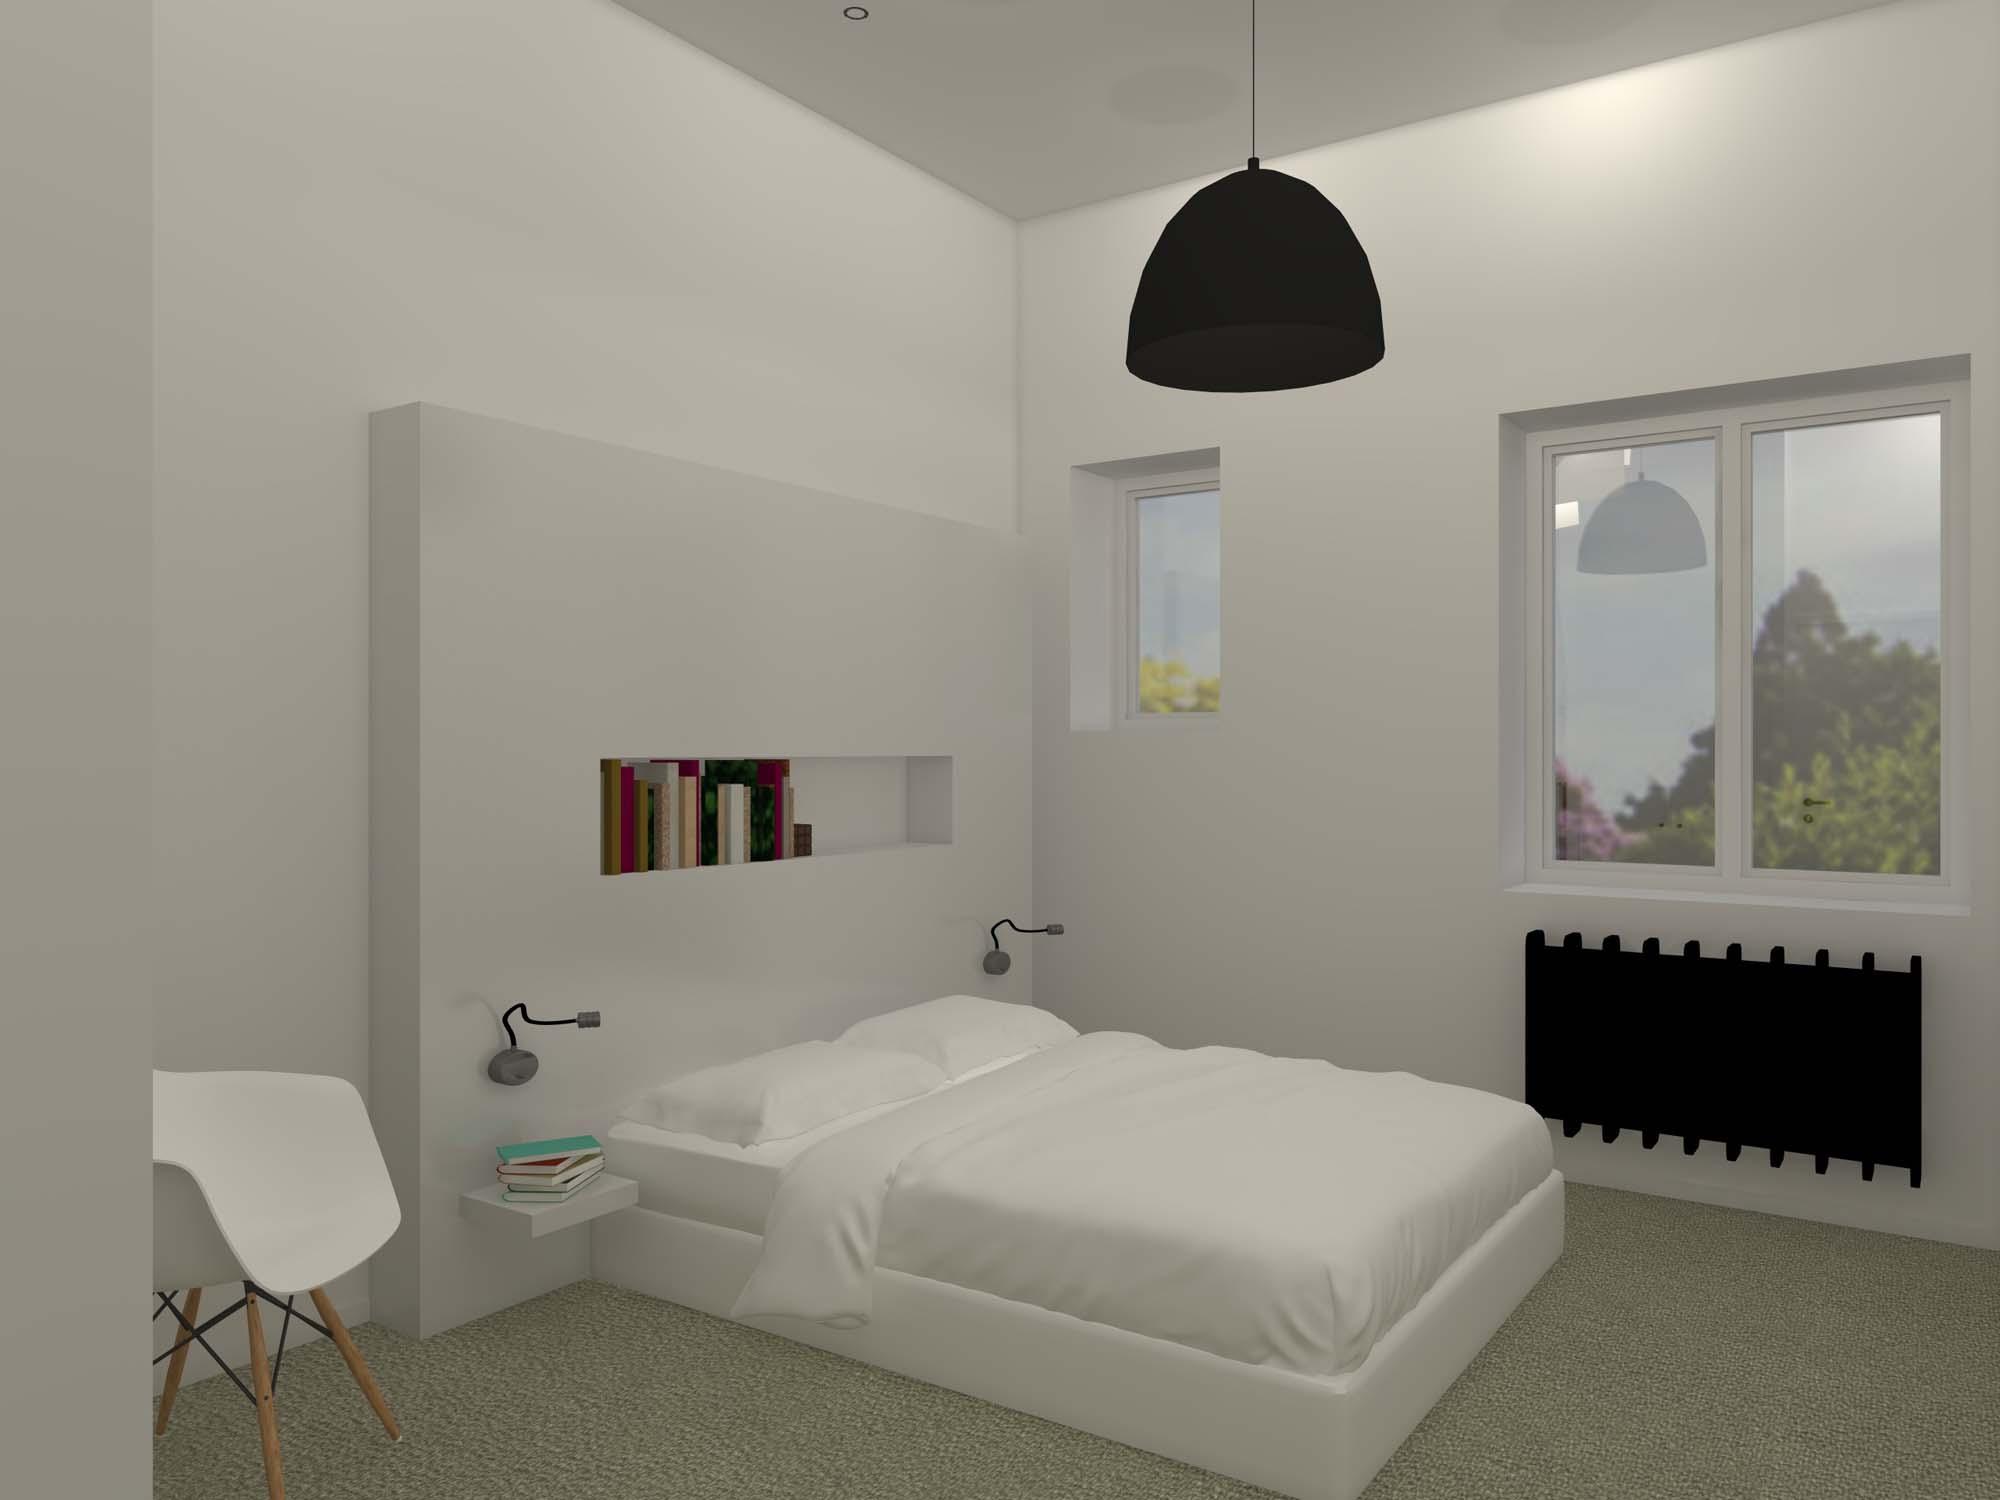 tete de lit chambre ado. Black Bedroom Furniture Sets. Home Design Ideas